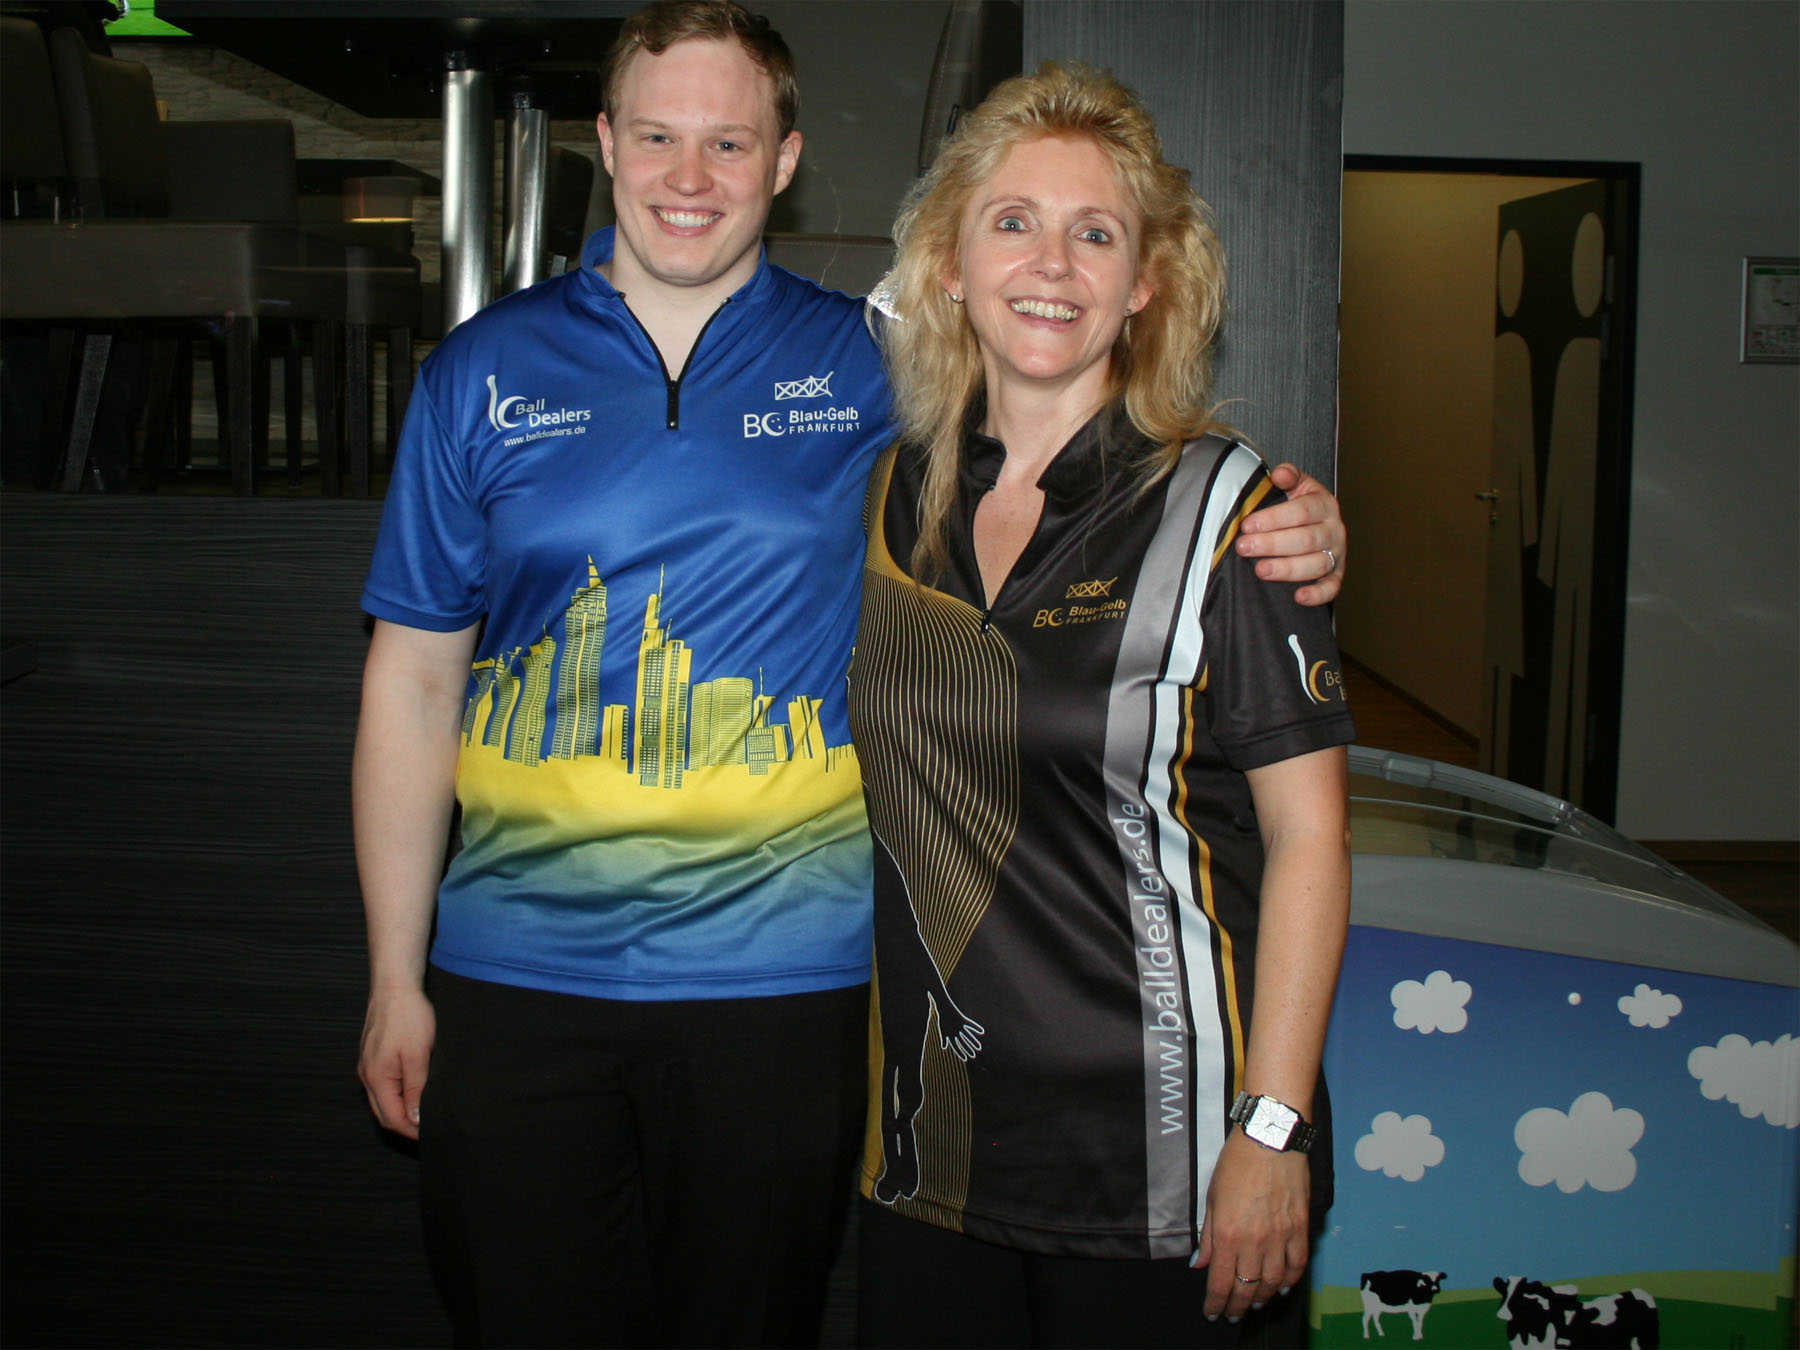 Vereinsmeister 2017: Petra Schmidt und Mike Mank